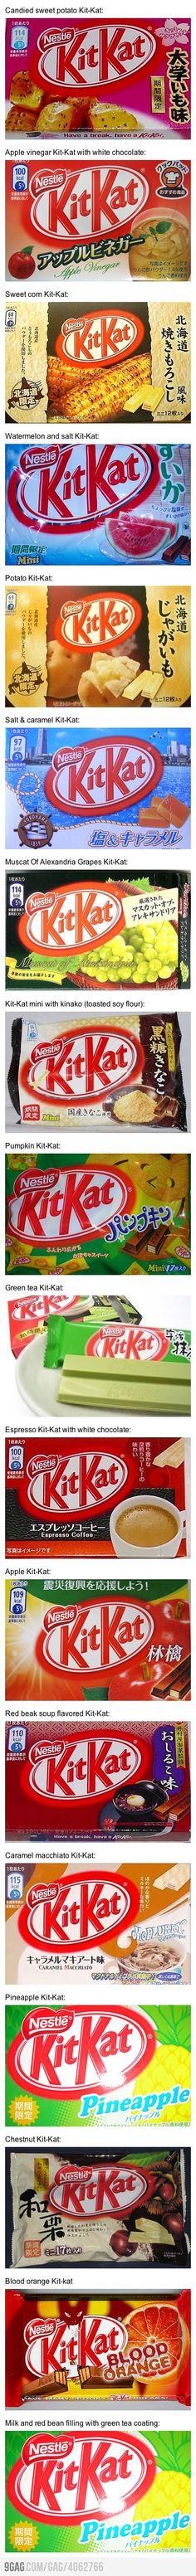 Meanwhile in Japan. Mother of Kit-Kat Japanese Snacks, Japanese Sweets, Japanese Food, Japanese Style, Japanese Kit Kat, Japanese Candy, Kit Kat Flavors, Kit Kat Bars, Roasted Corn